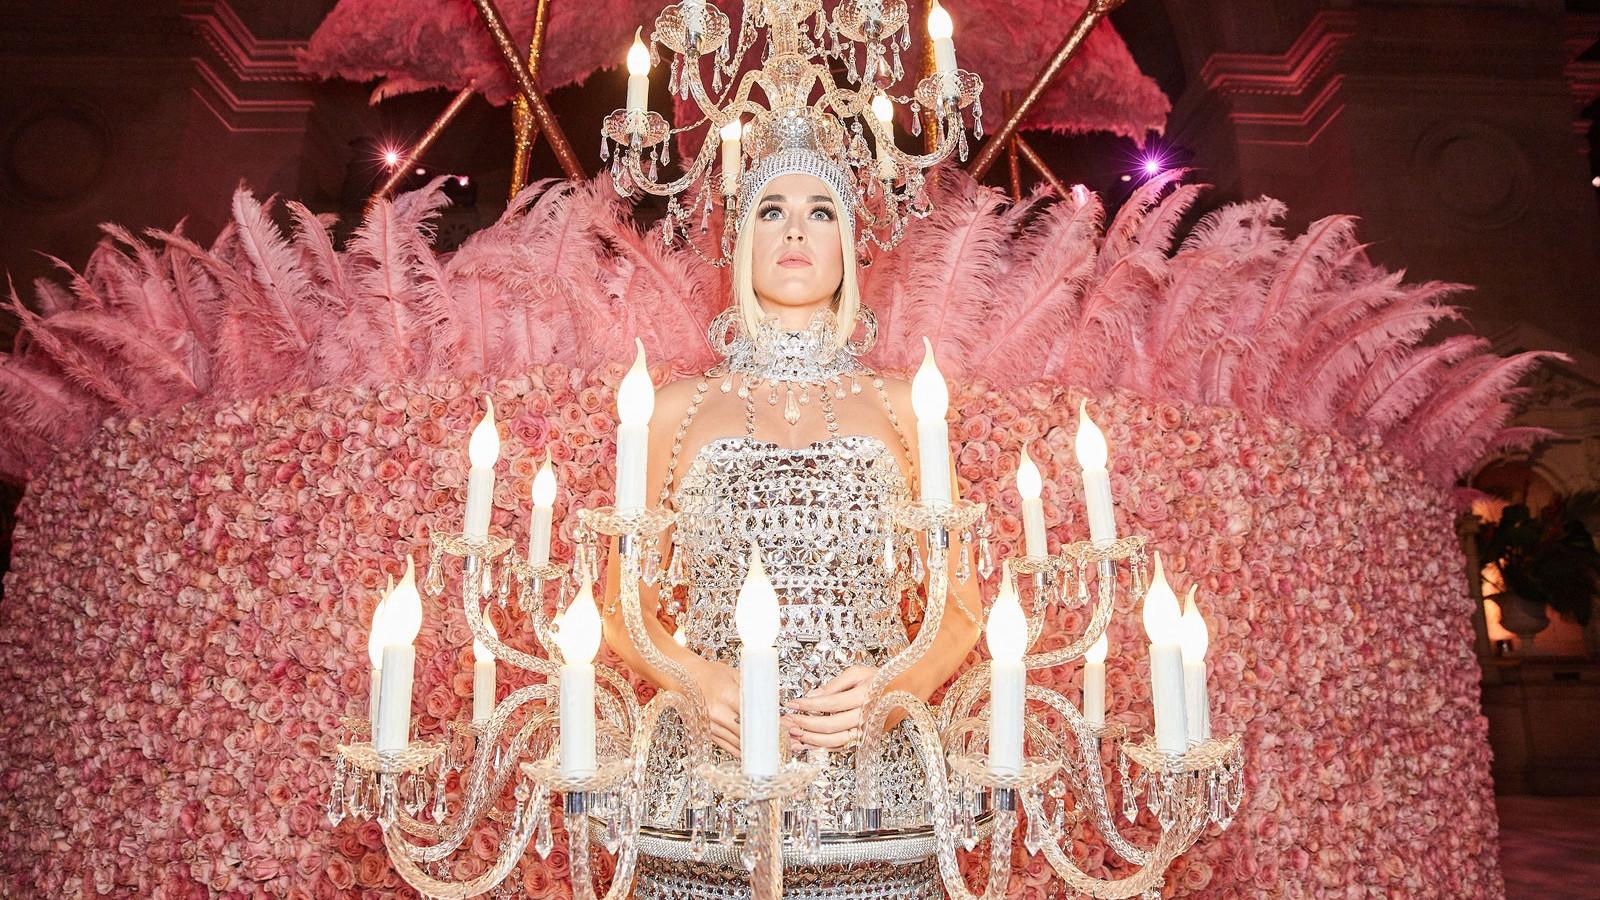 02300-CT-metgala19-arrivals (1) - Jenae Holloway - US - Vogue - Costume Benefit Met Gala